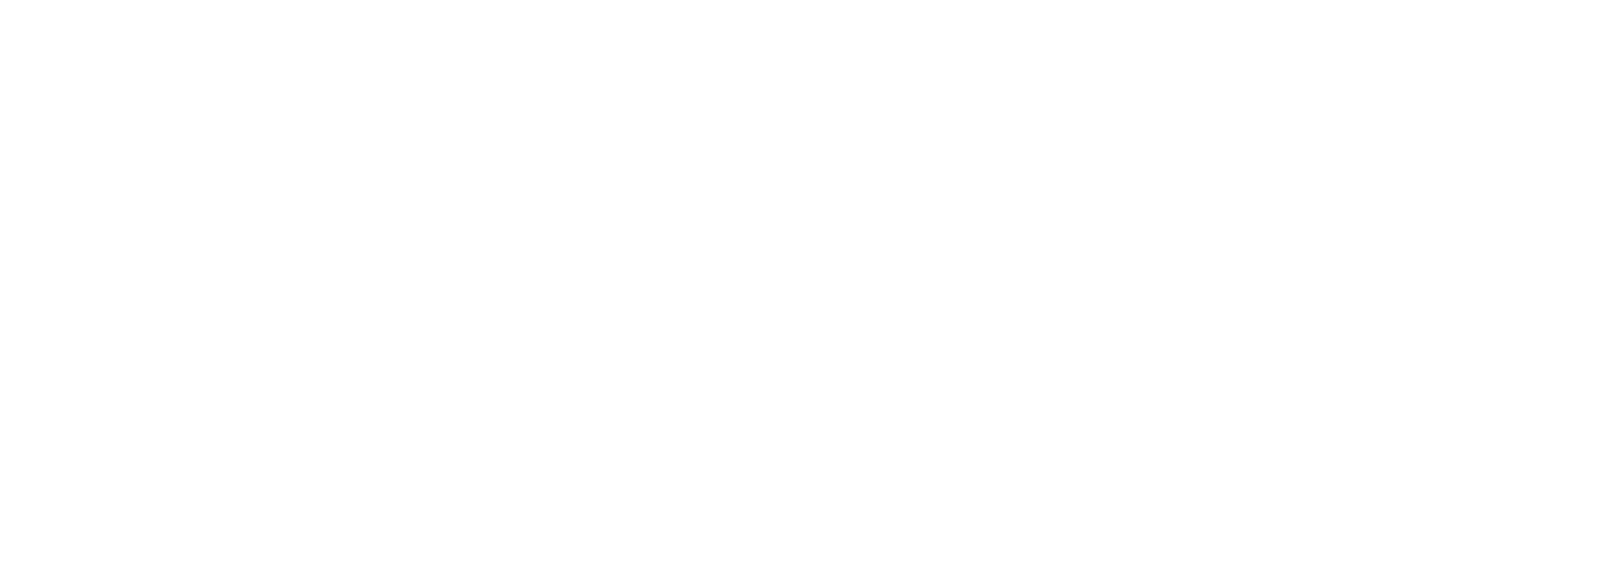 hbm metal roofing logo white